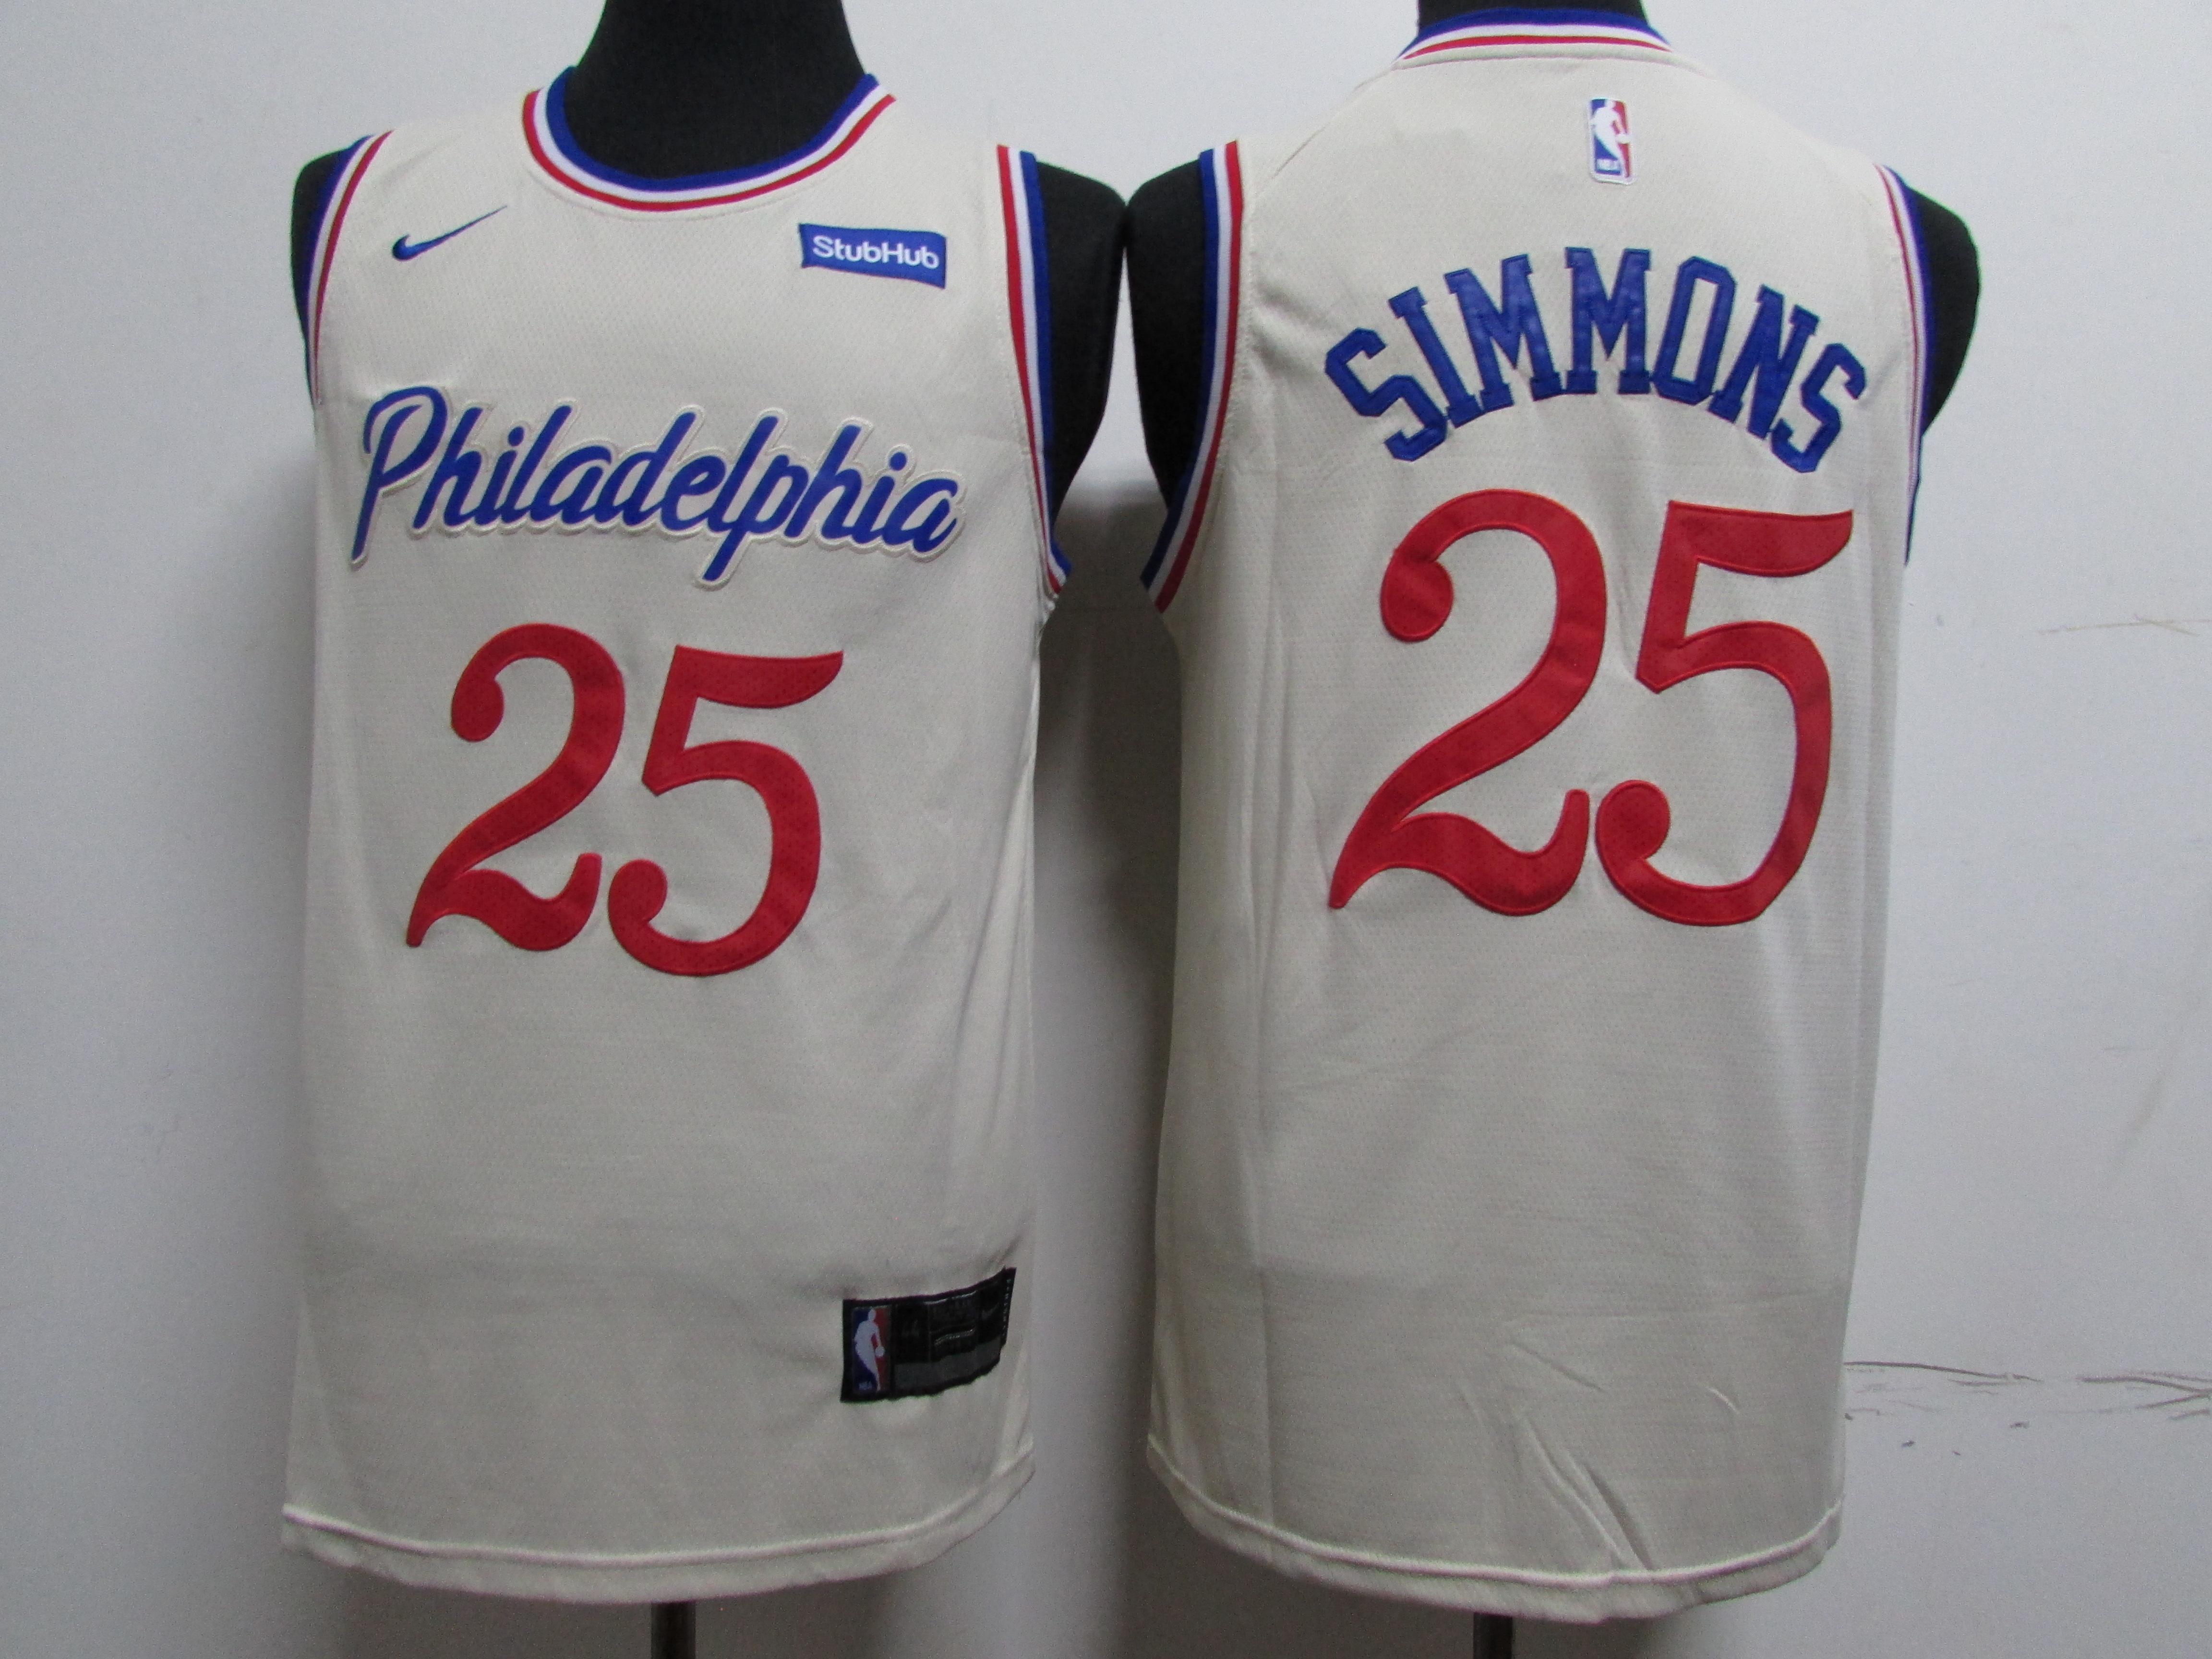 76ers 25 Ben Simmons Cream 2019-20 City Edition Nike Swingman Jersey